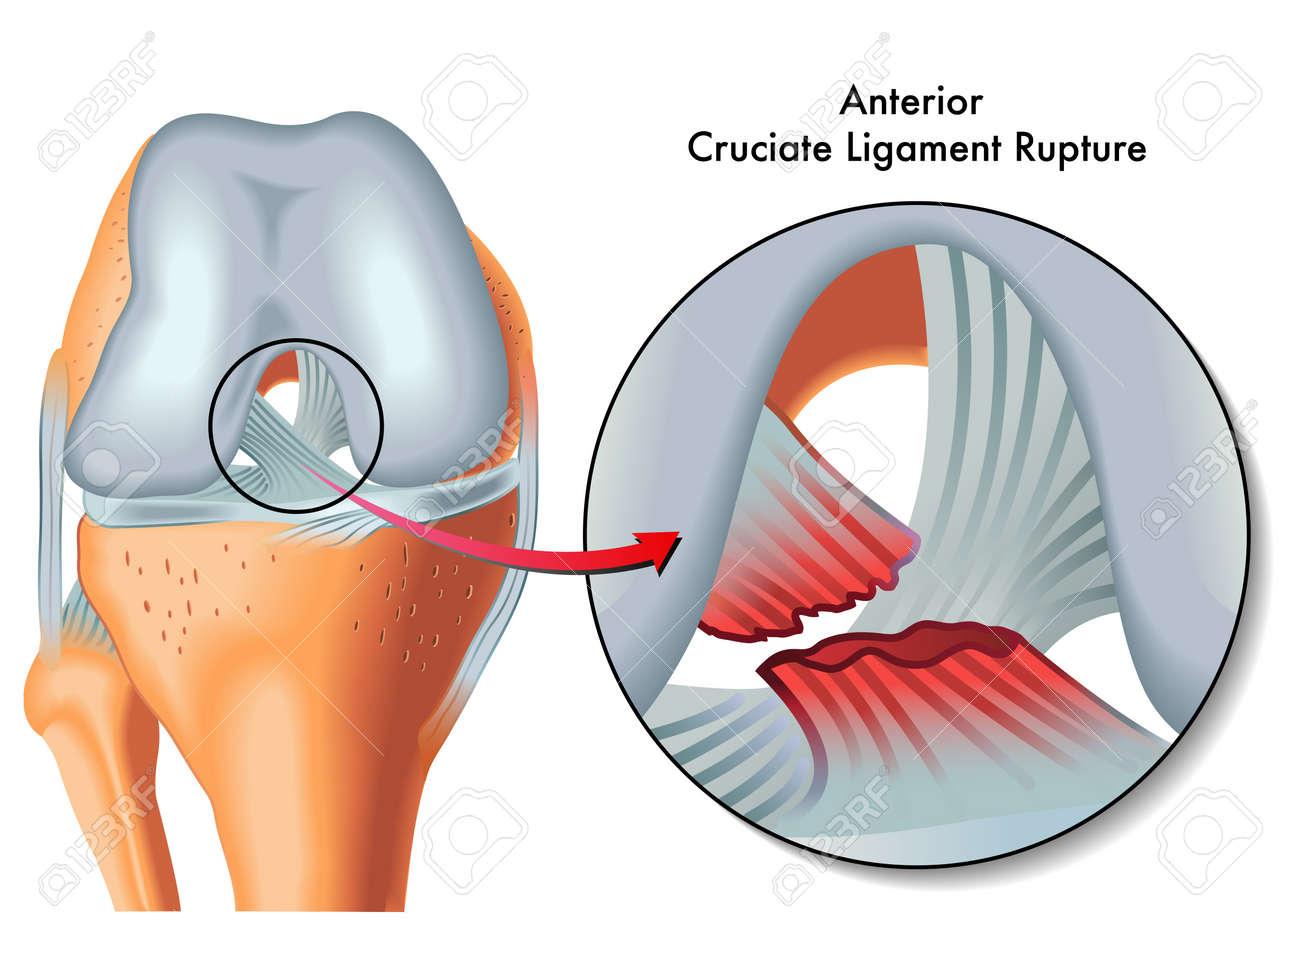 Anterior Cruciate Ligament Rupture Royalty Free Cliparts, Vectors ...